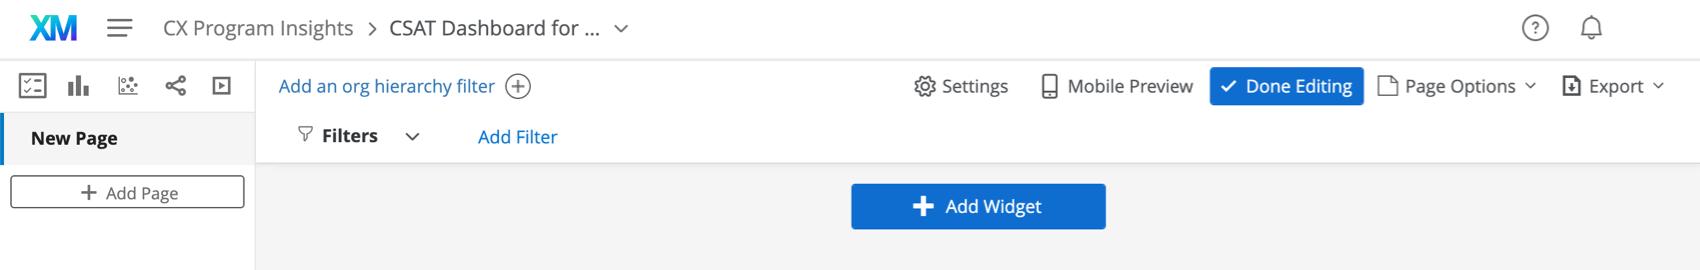 Editing mode. Done editing button blue upper-right, add widget button bottom center